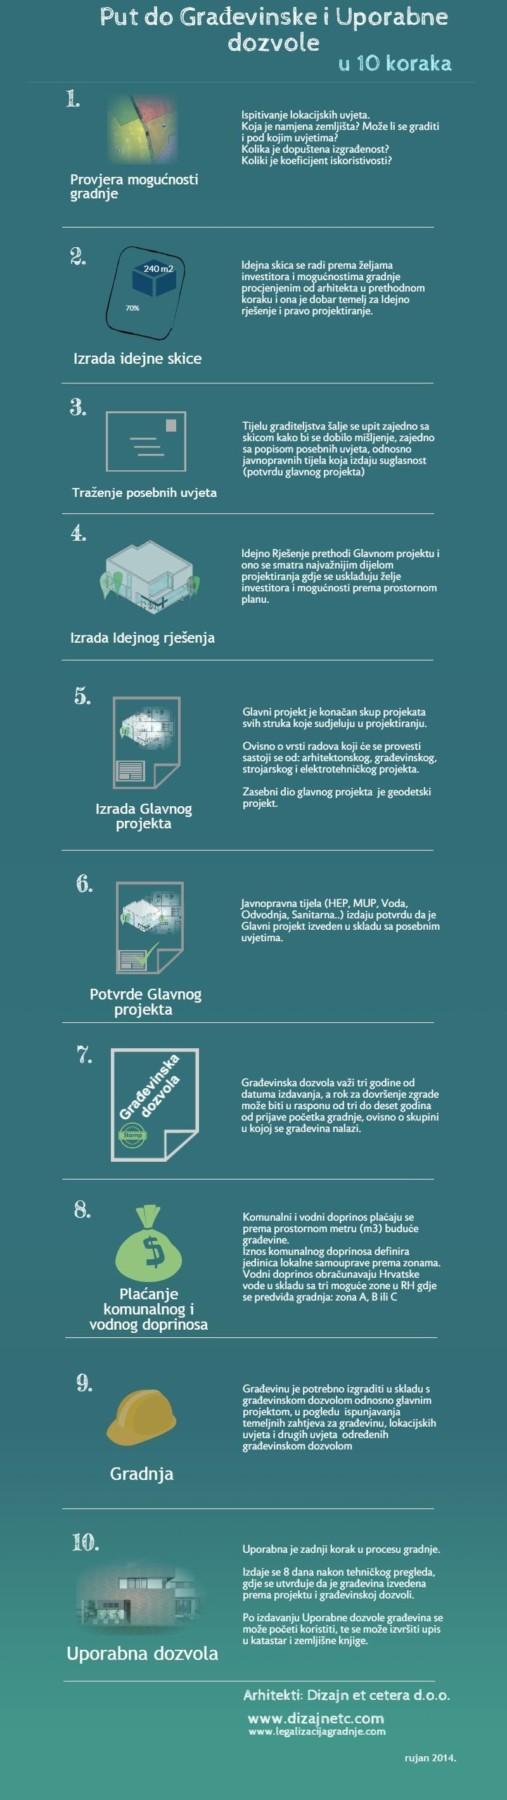 Put do građevinske i uporabne (4)